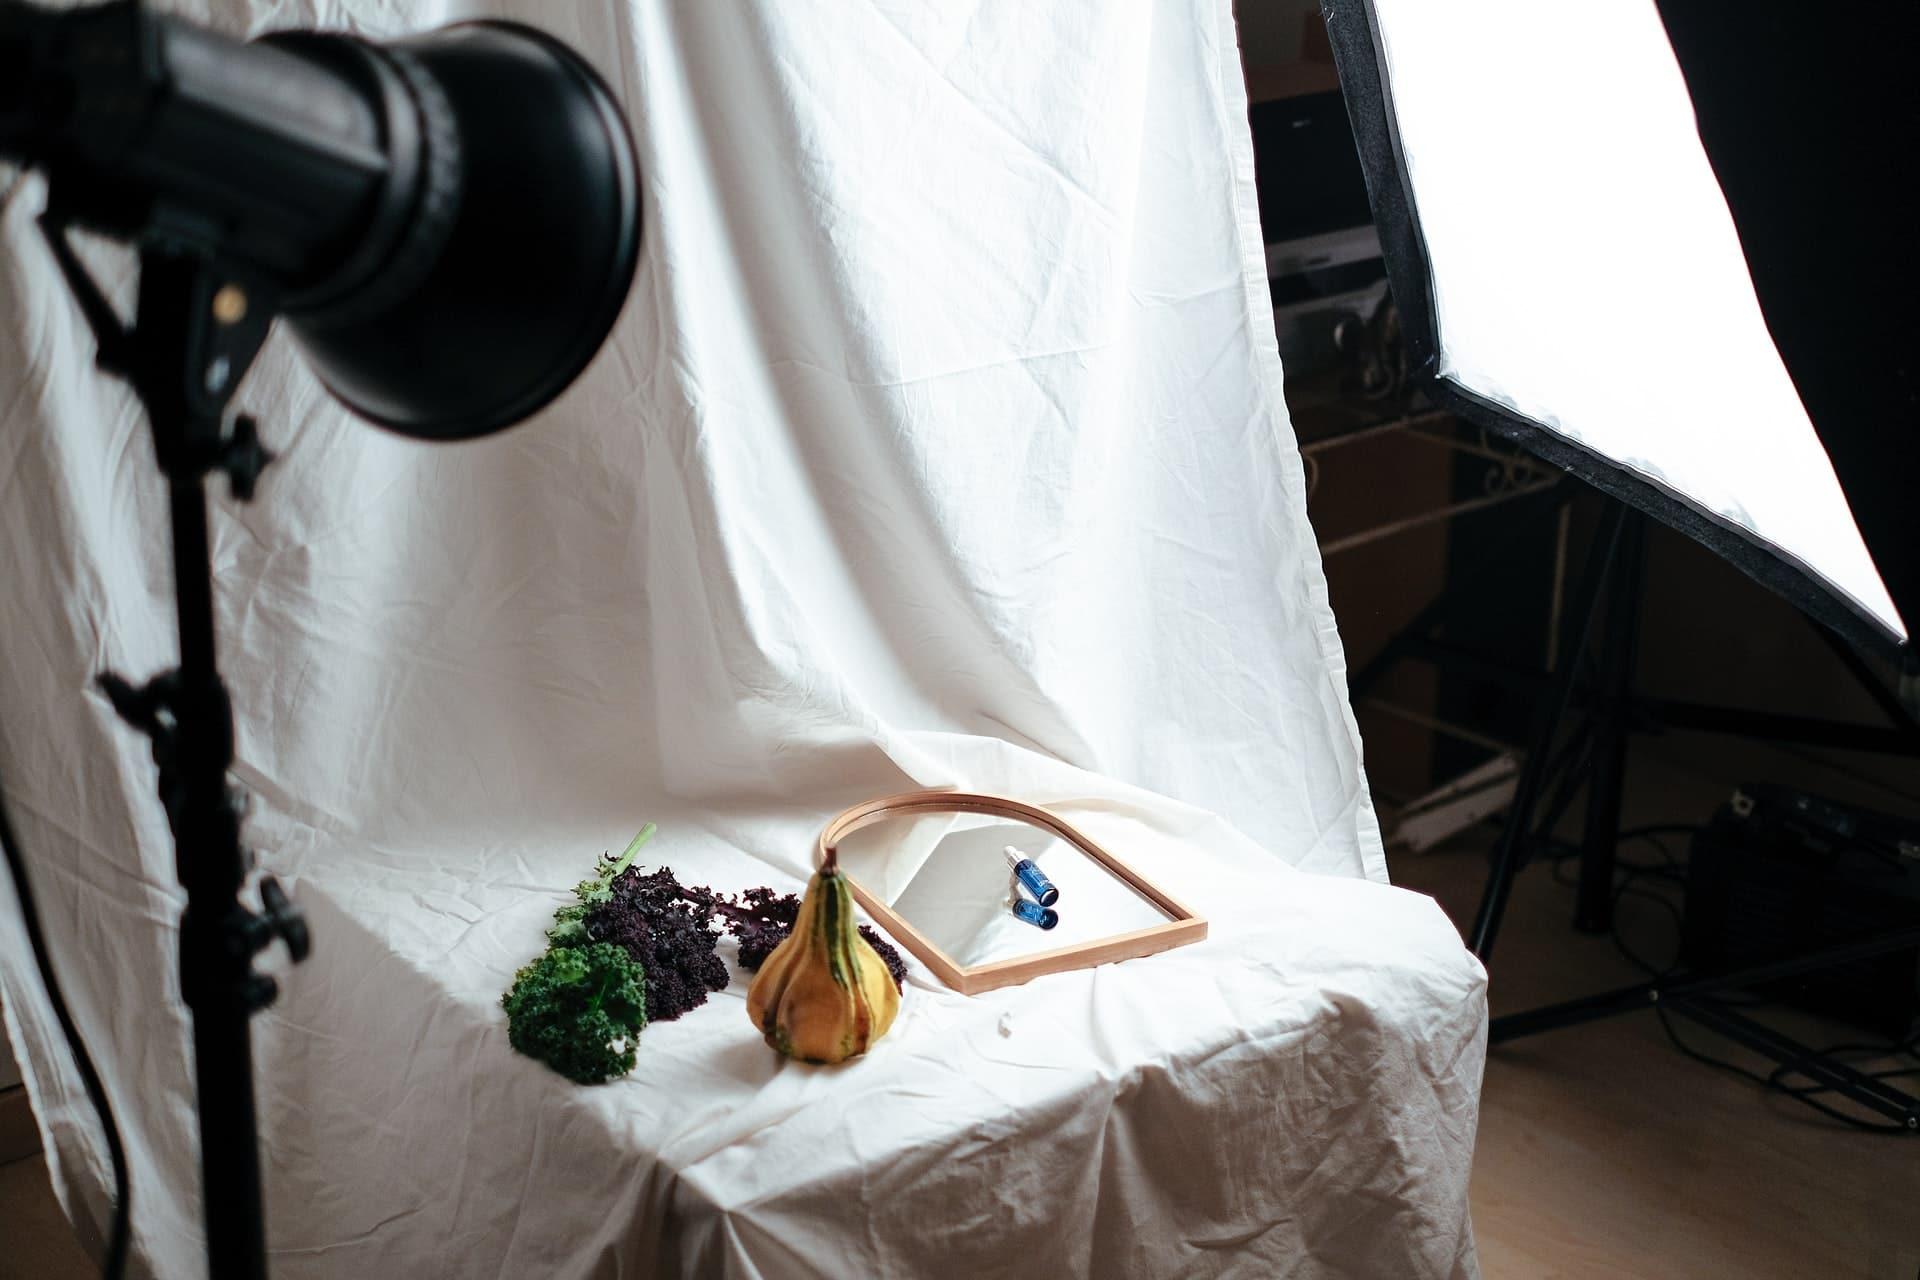 Jasa Foto Produk Jogja - Shaniba Creative Industry